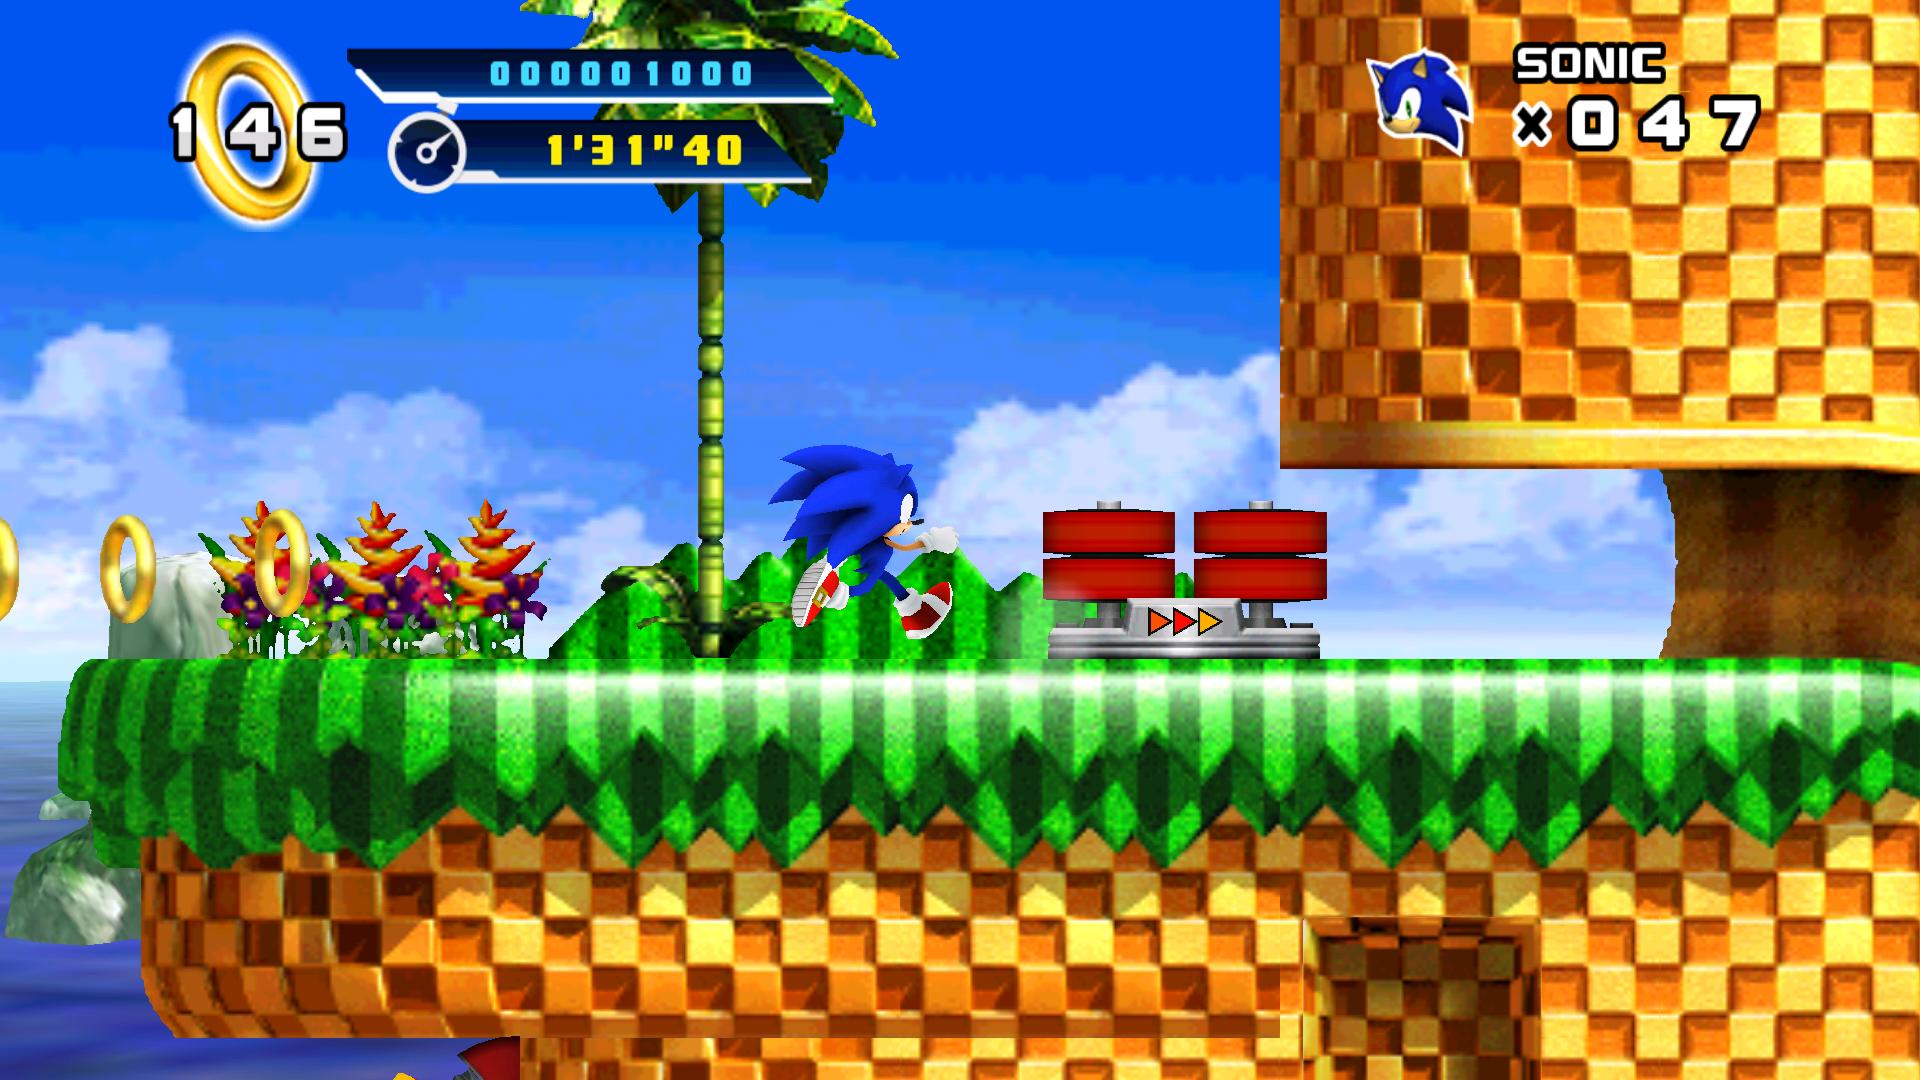 Sonic 4™ Episode I screenshot #7